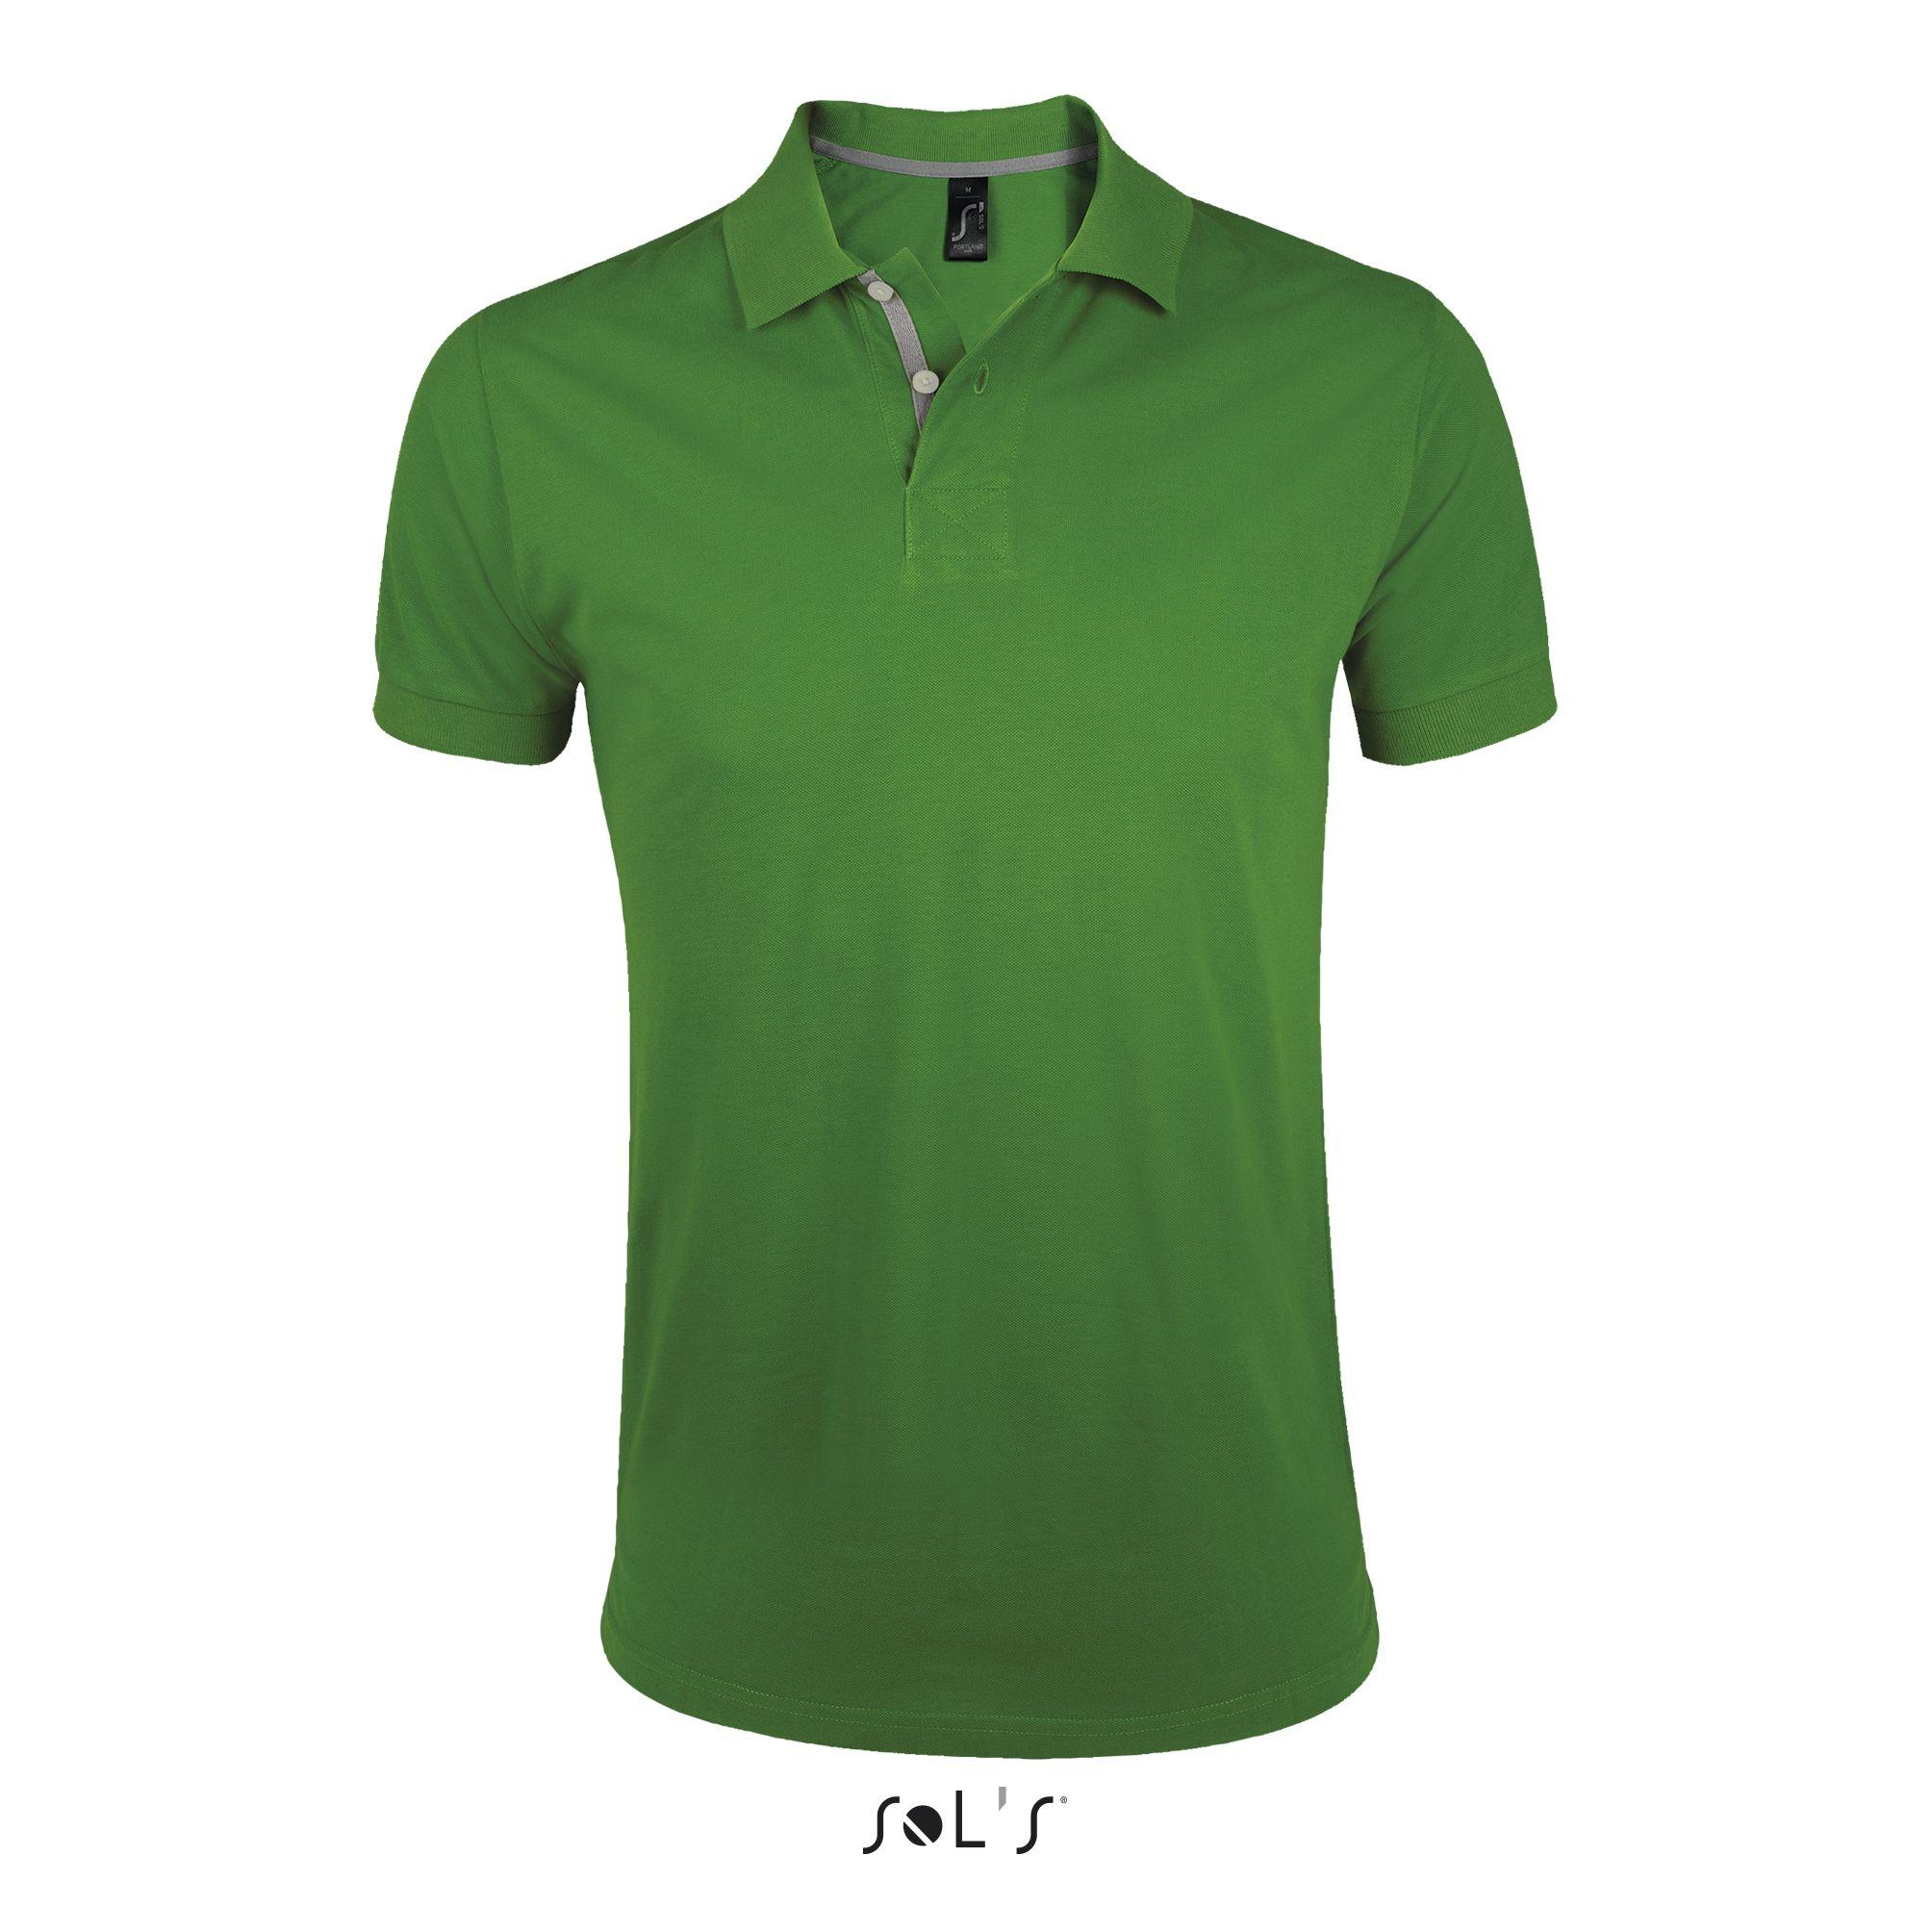 284 - Bud green